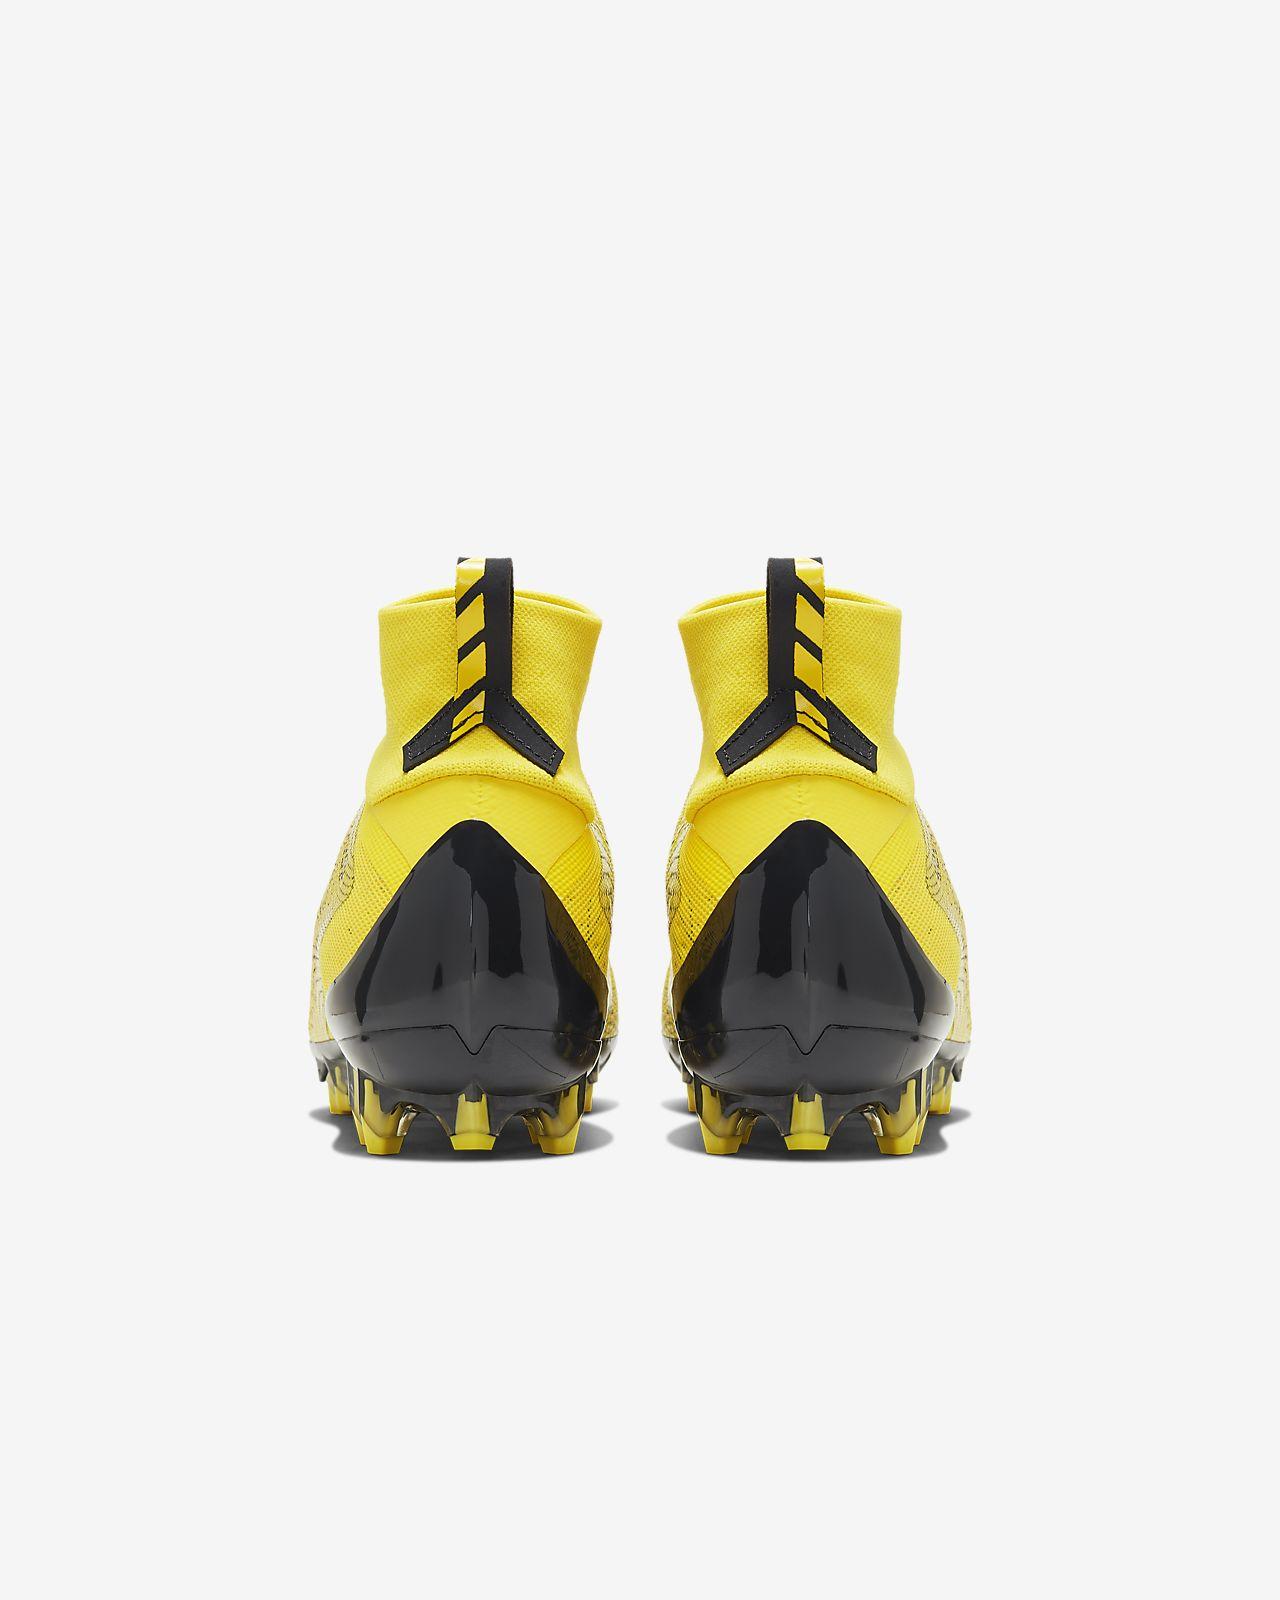 bd0706011ae9 Nike Vapor Untouchable 3 Pro Football Cleat. Nike.com